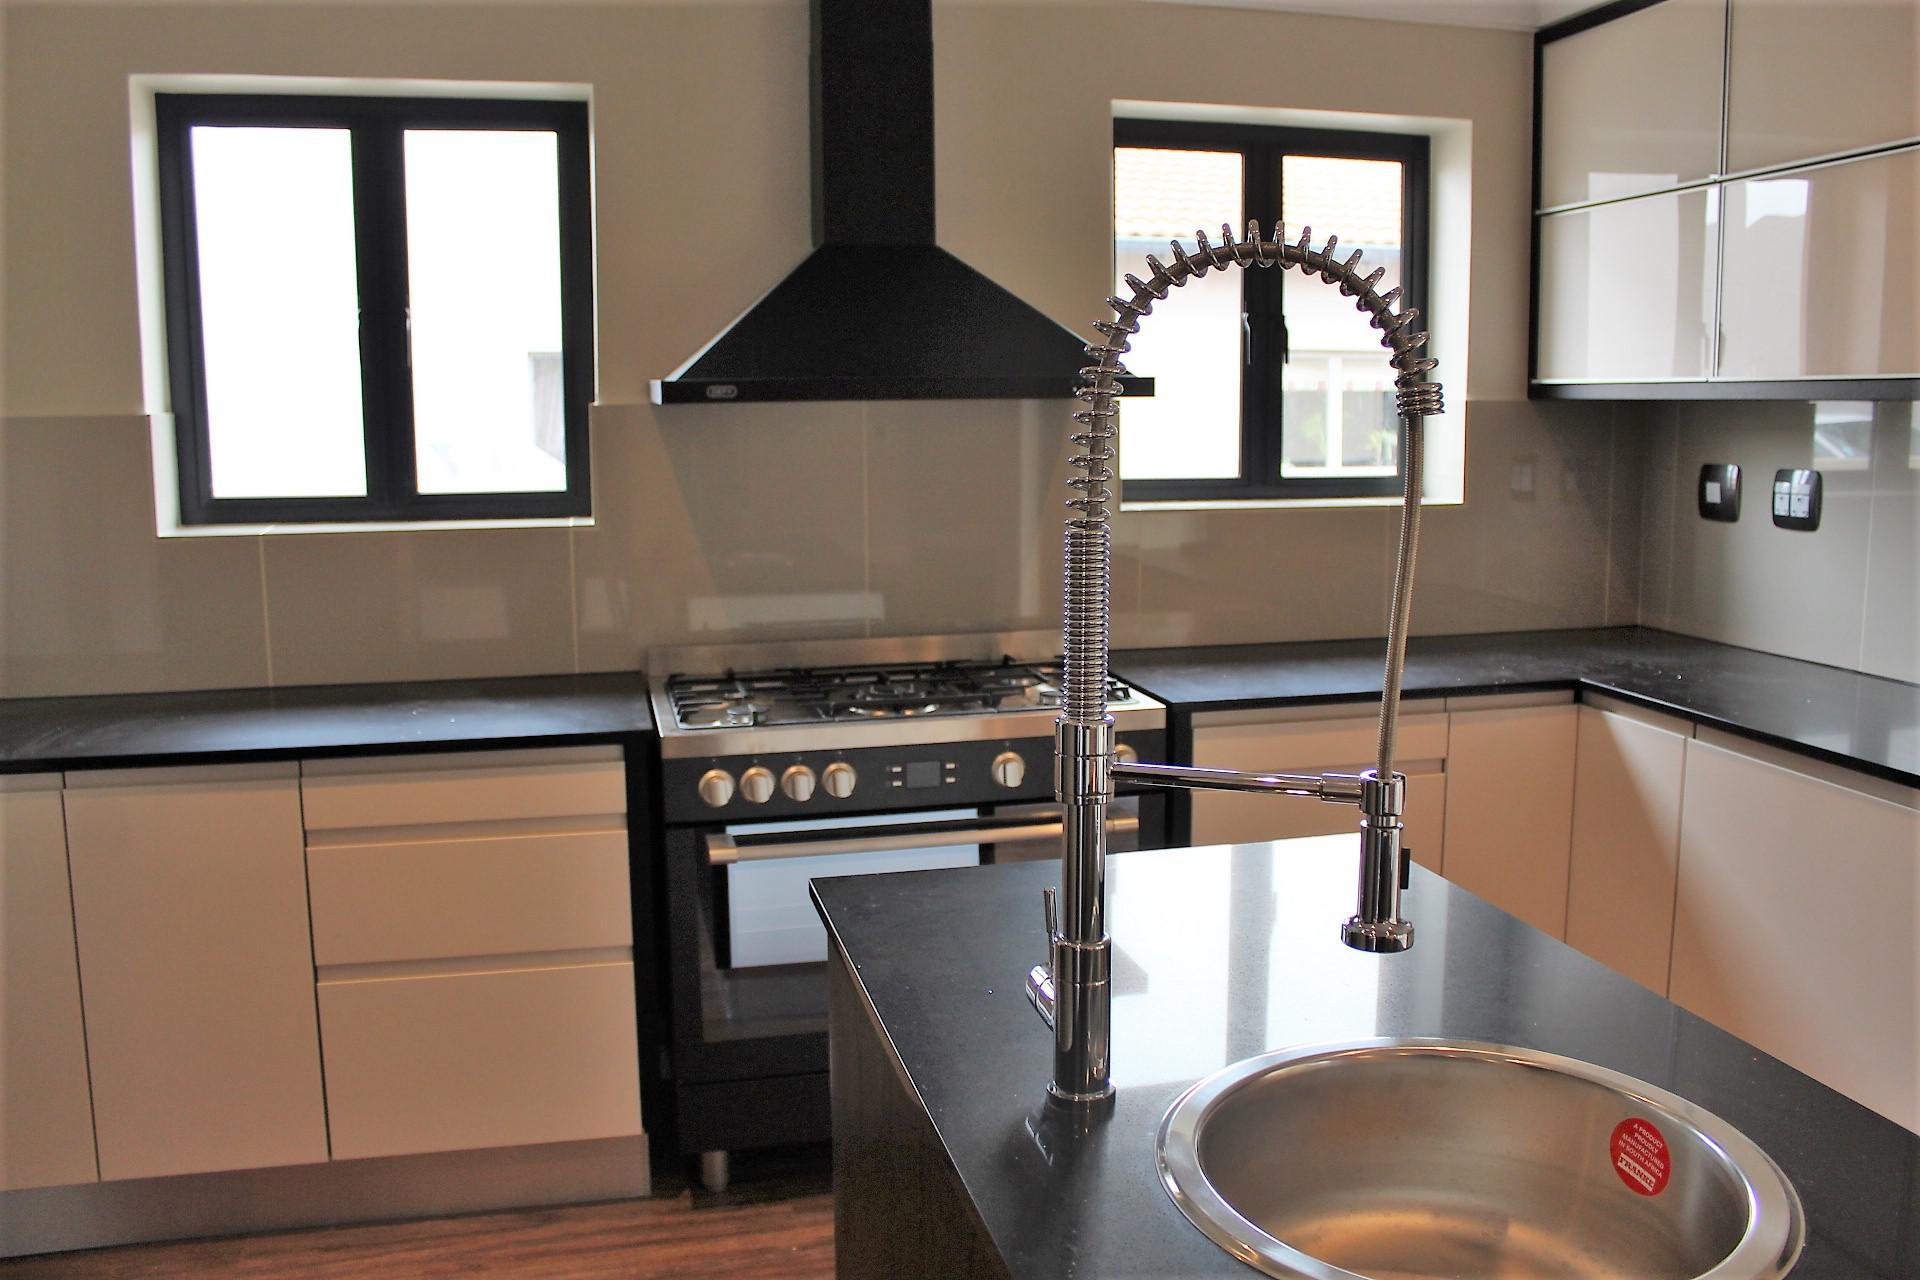 4 Bedroom House For Sale For Sale In Durbanville Mr237480 Myroof